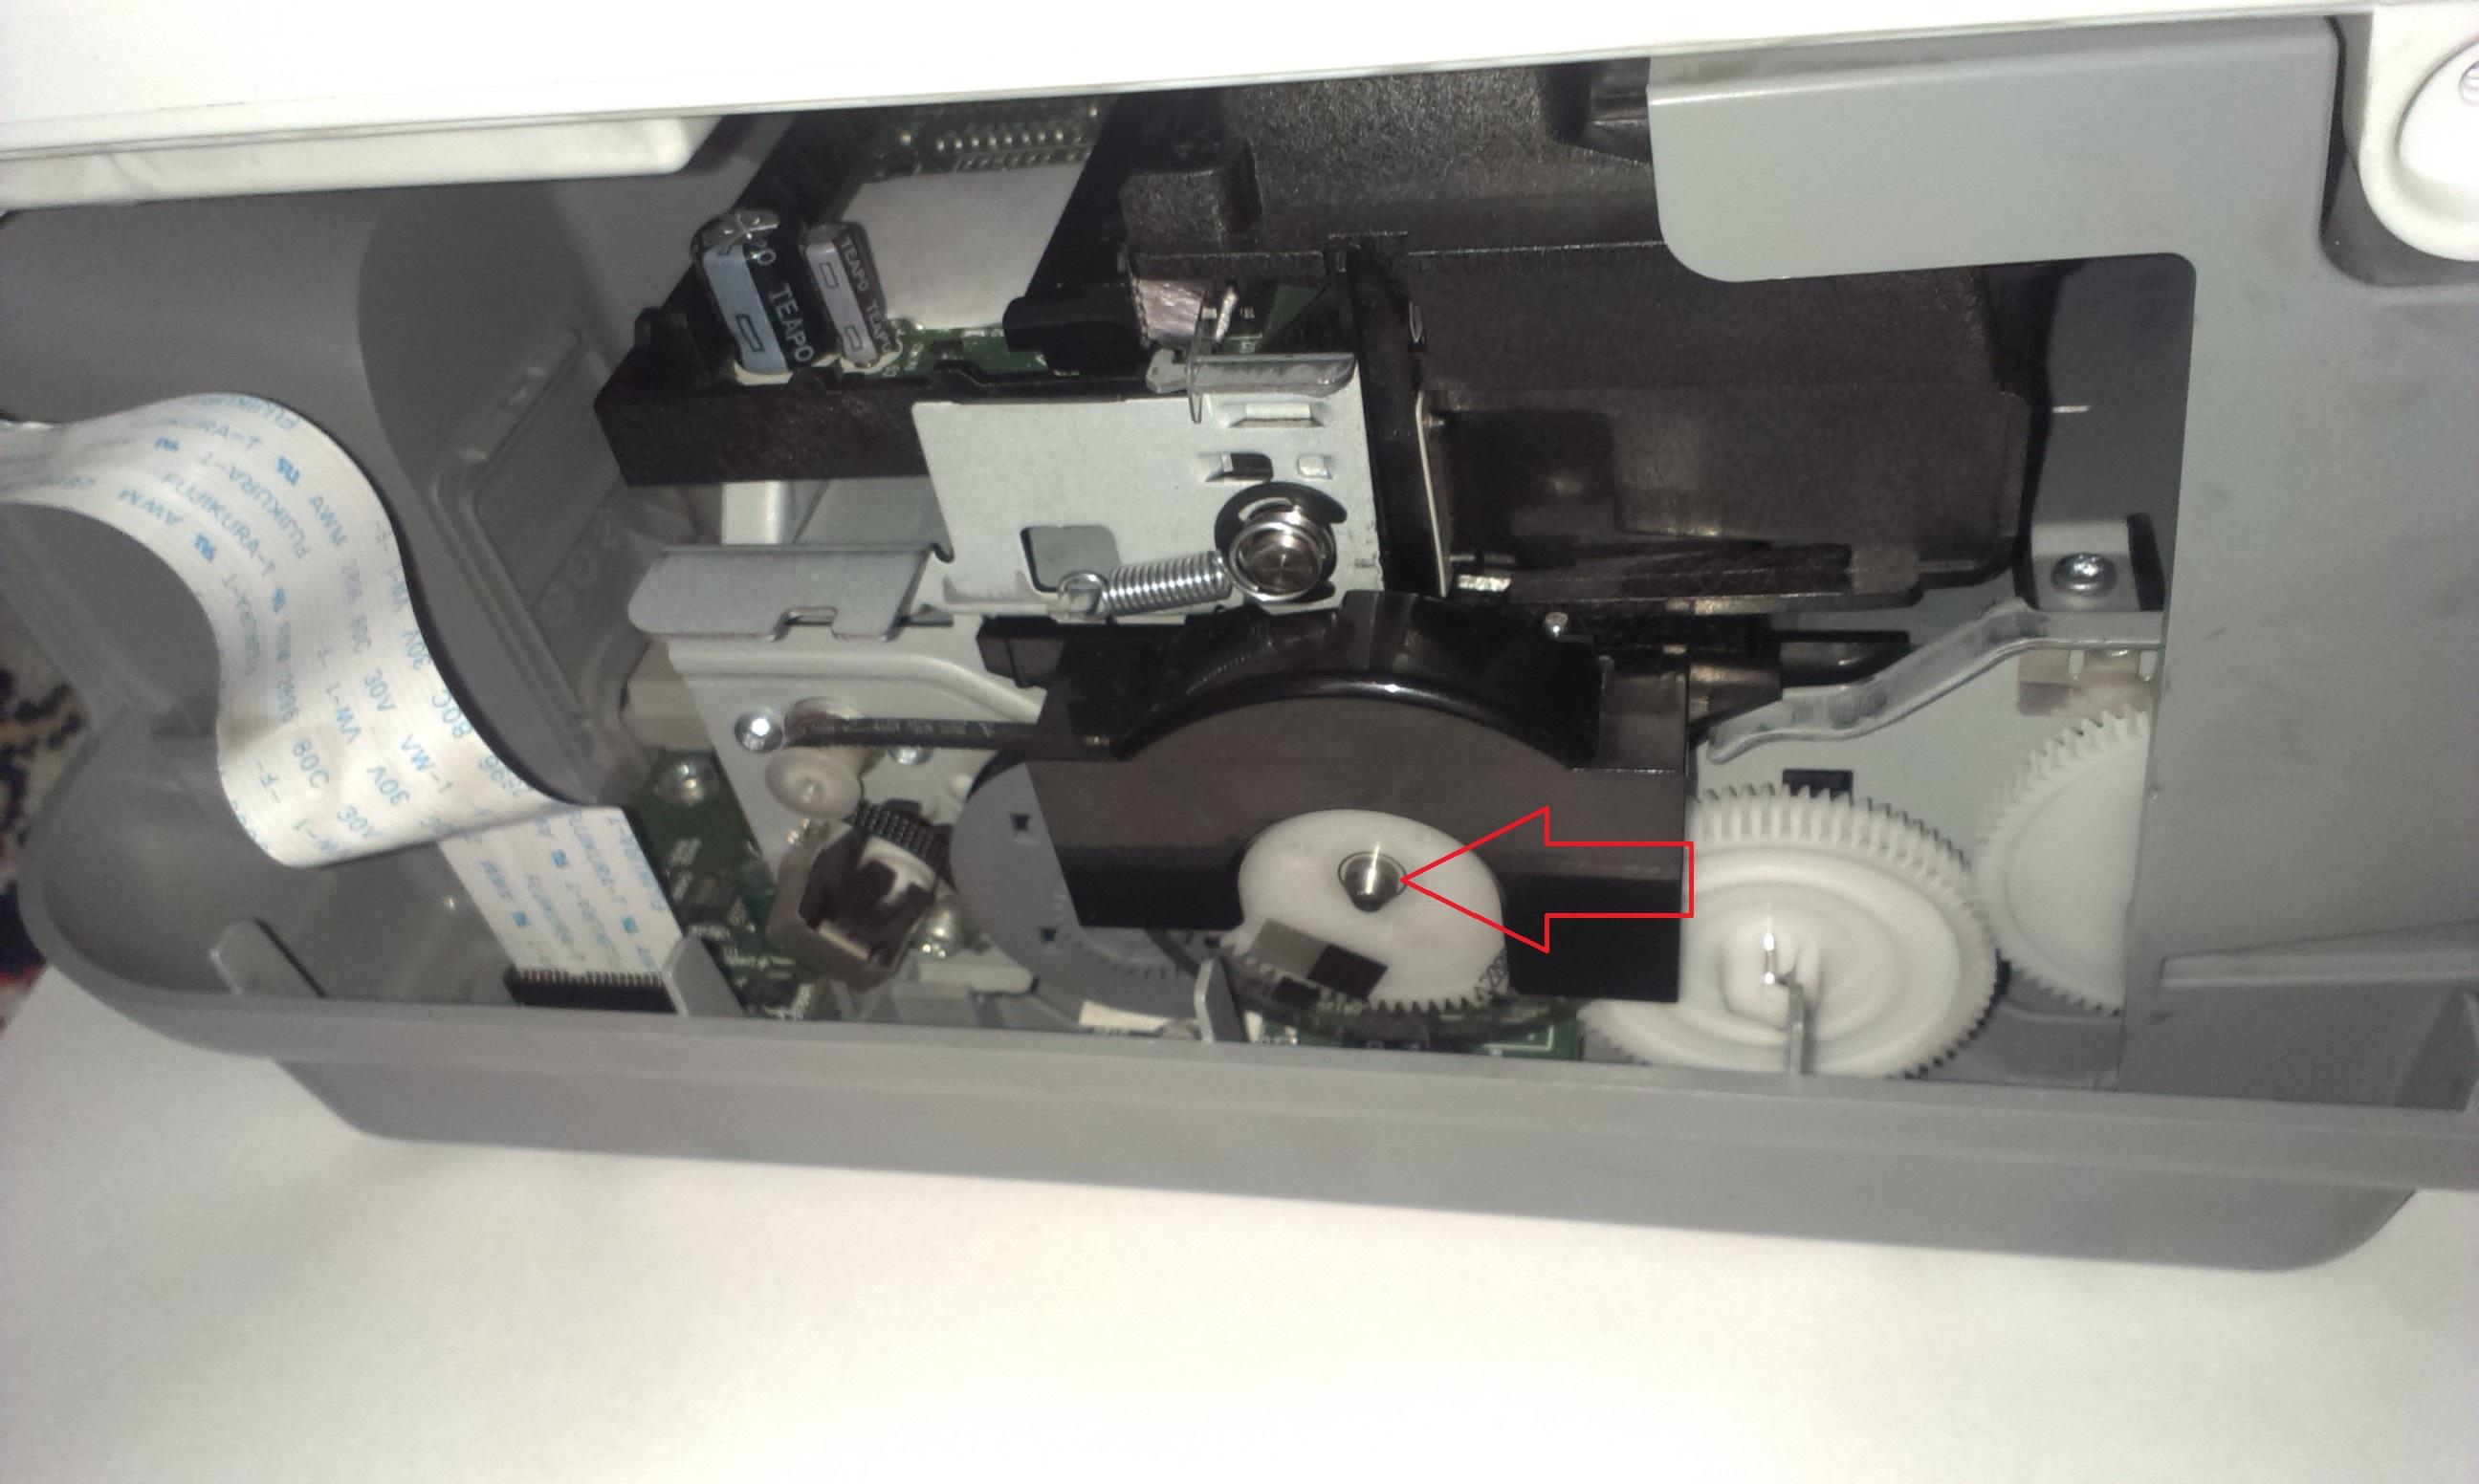 HP PSC1510 - Drukarka nie pobiera papieru